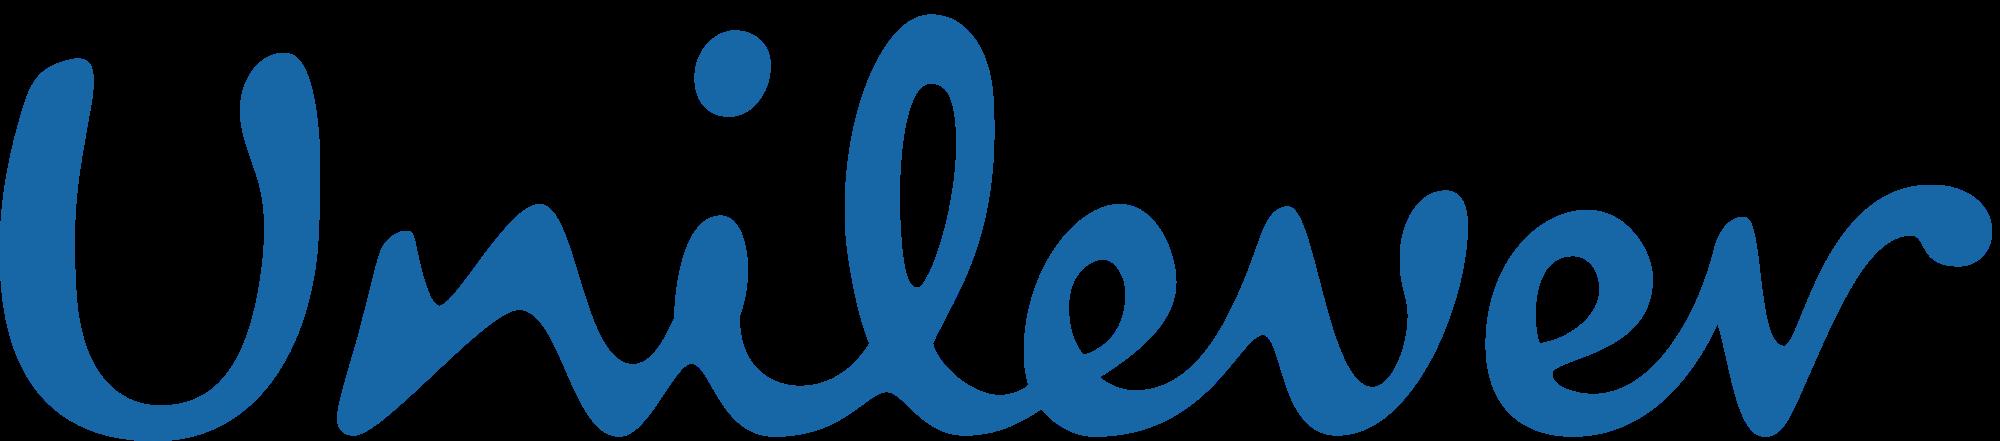 Depiction of Unilever